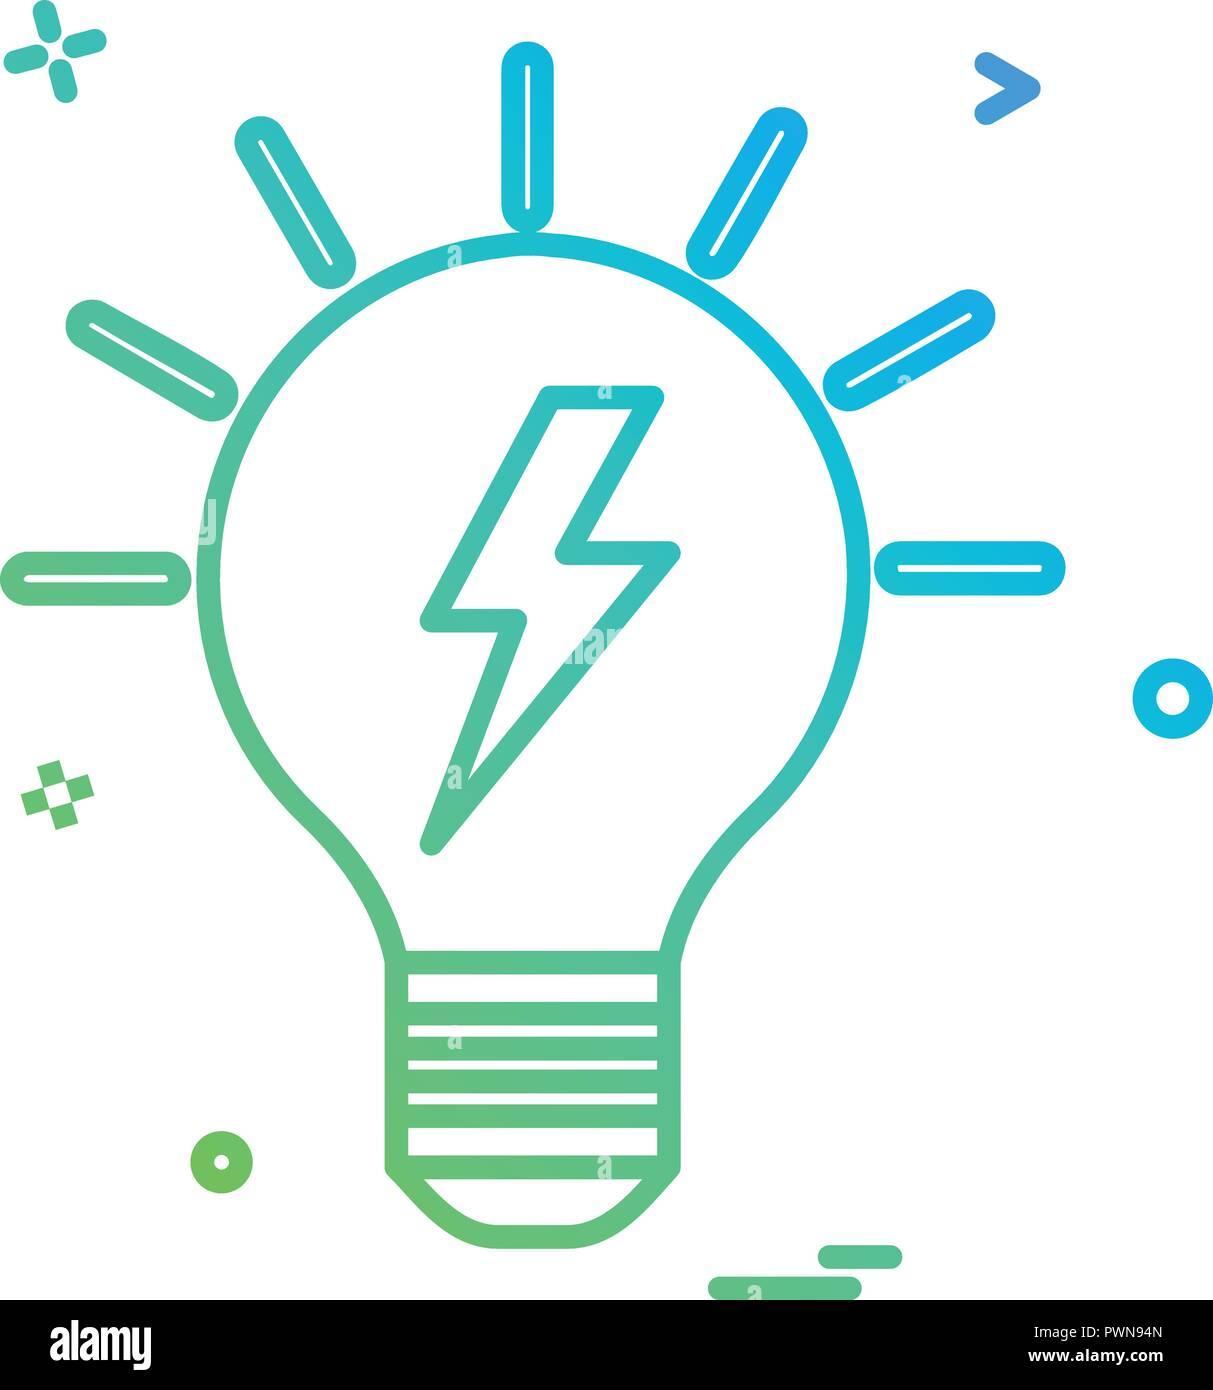 Blub Power Electric Icon Vector Design Stock Art Circuit Schematic Symbols